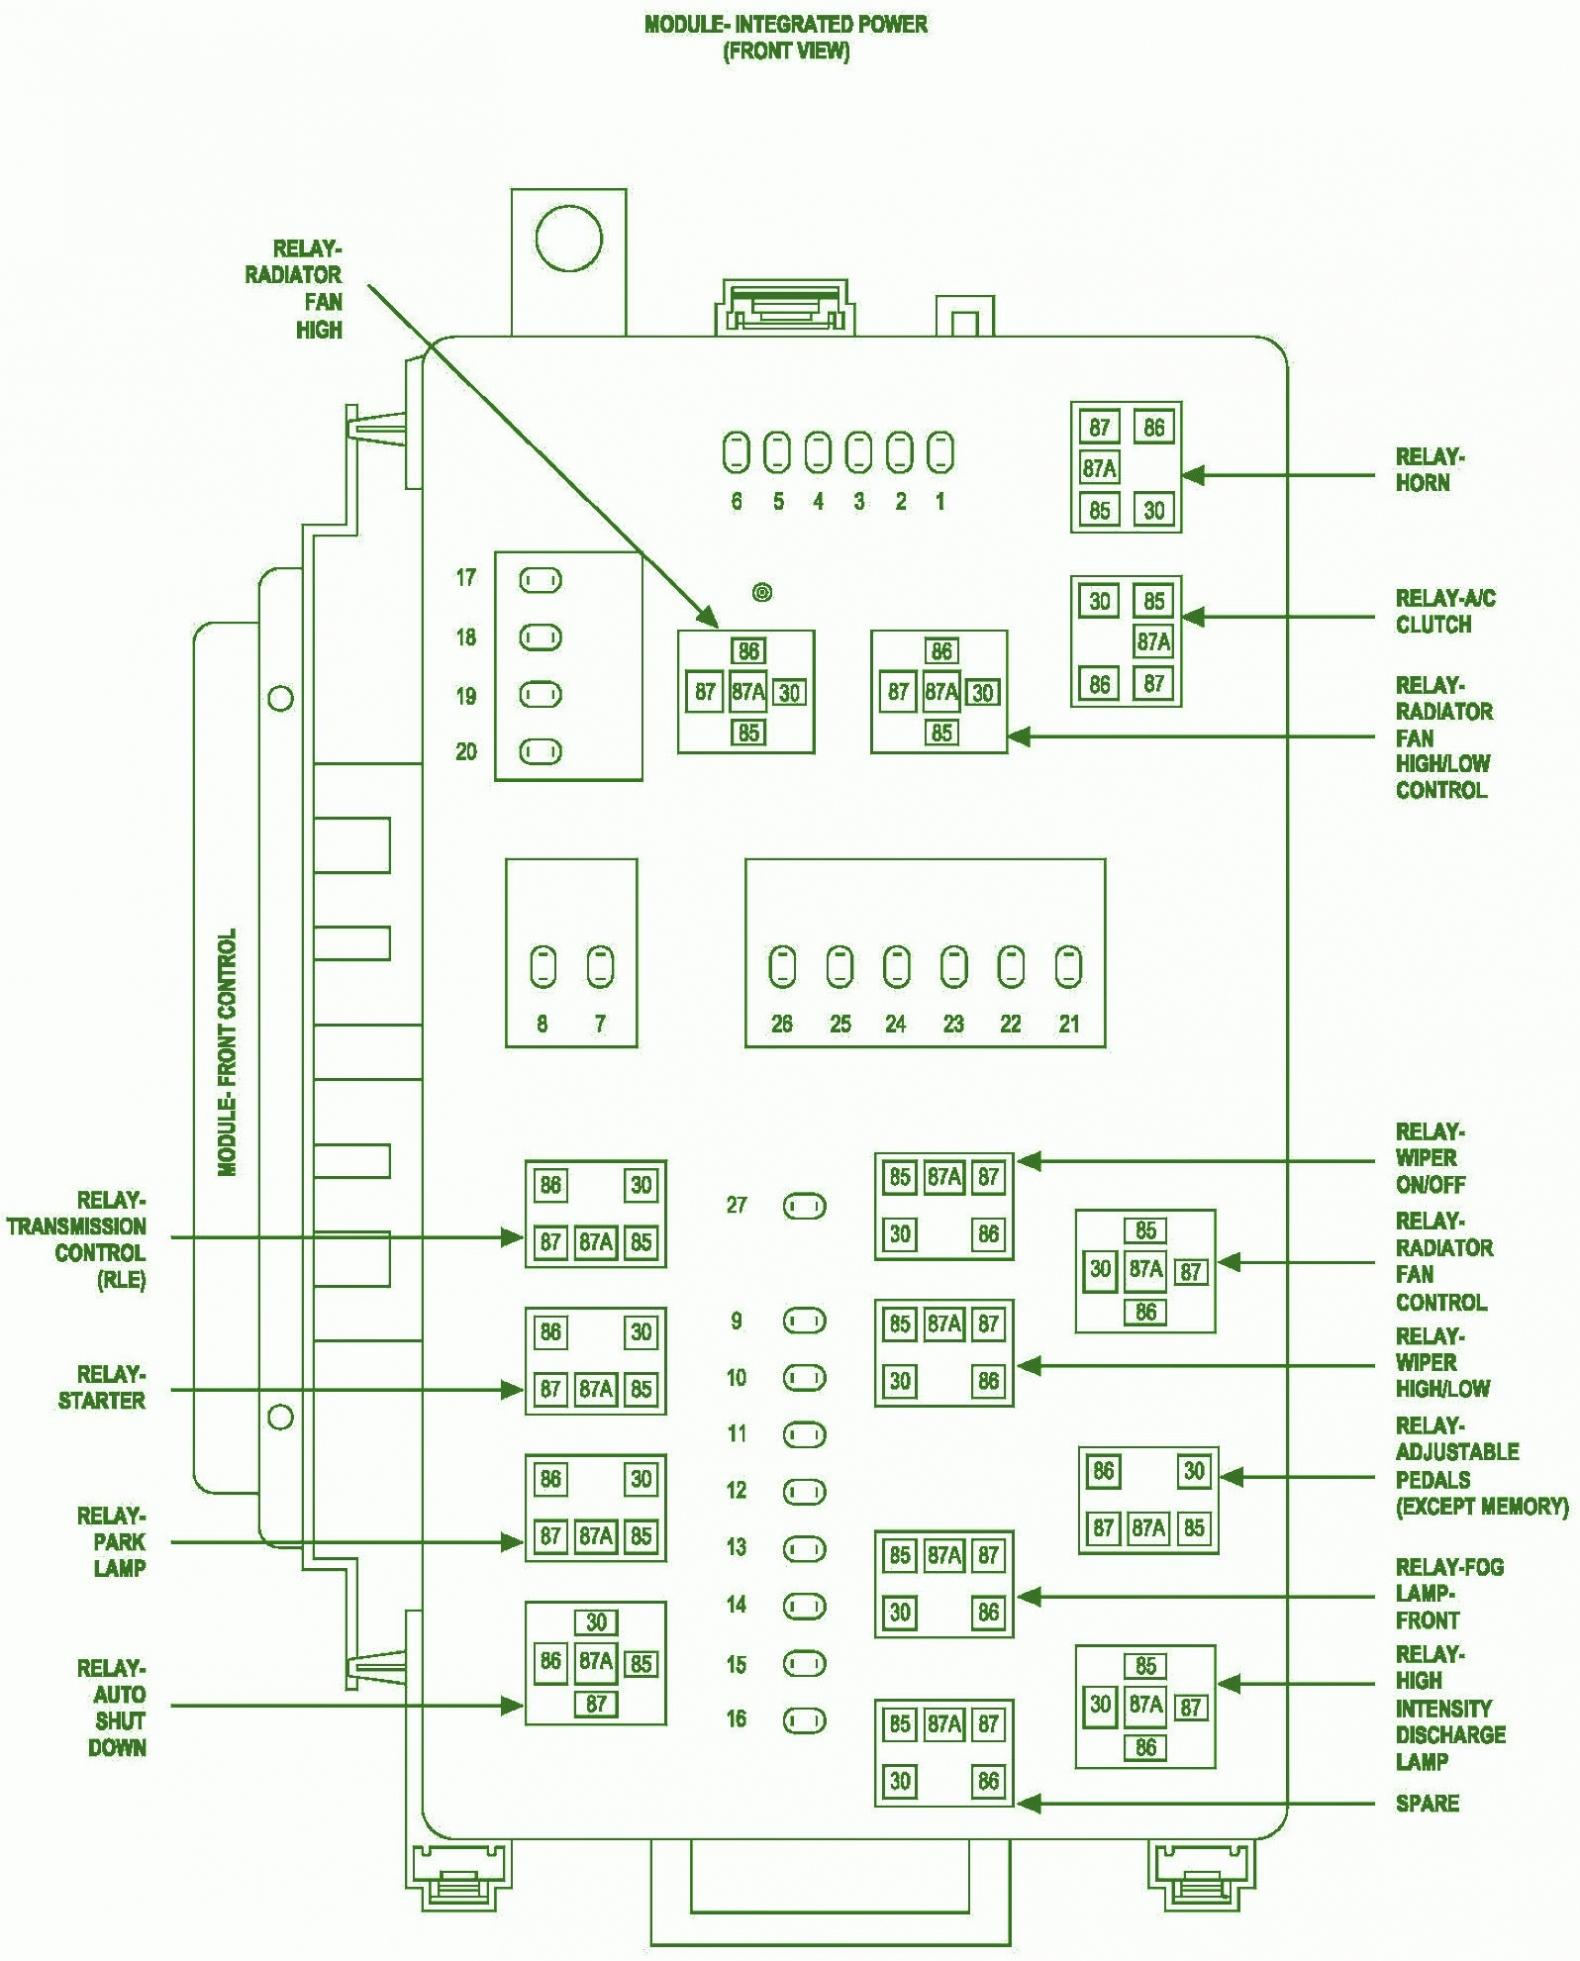 04 Durango Fuse Diagram | Best Wiring Library - 2004 Dodge Durango Radio Wiring Diagram